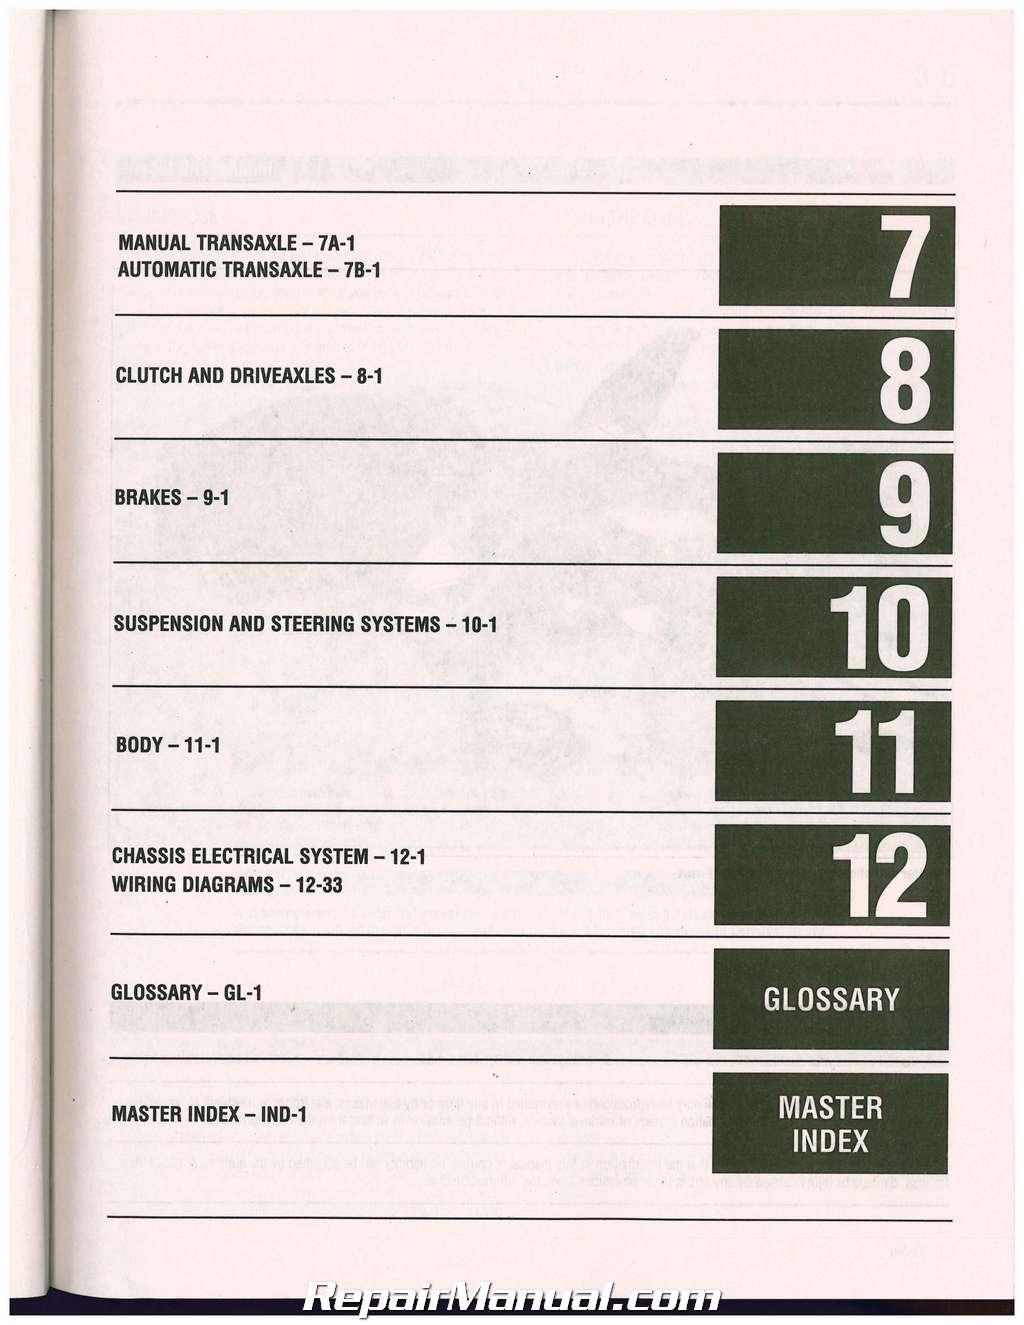 Ford Focus 2012 2013 2014 Chilton Automotive Repair Manual 2003 Tune Up Diagram Wiring Schematic